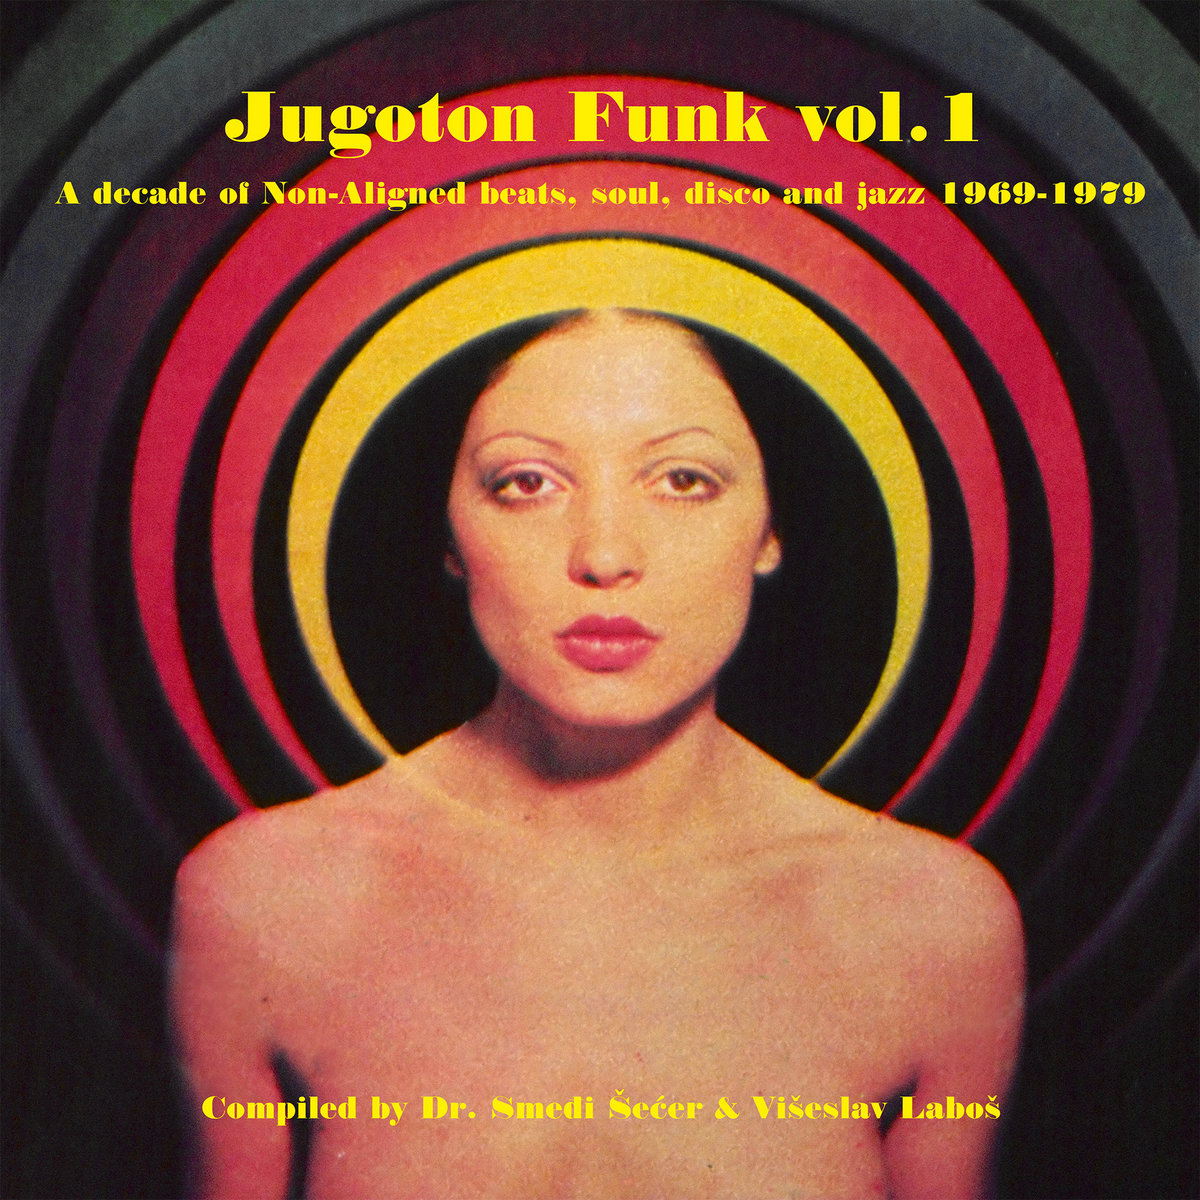 Jugoton Funk Vol. 1 - A Decade Of Non-Aligned Beats, Soul, Disco And Jazz 1969-1979